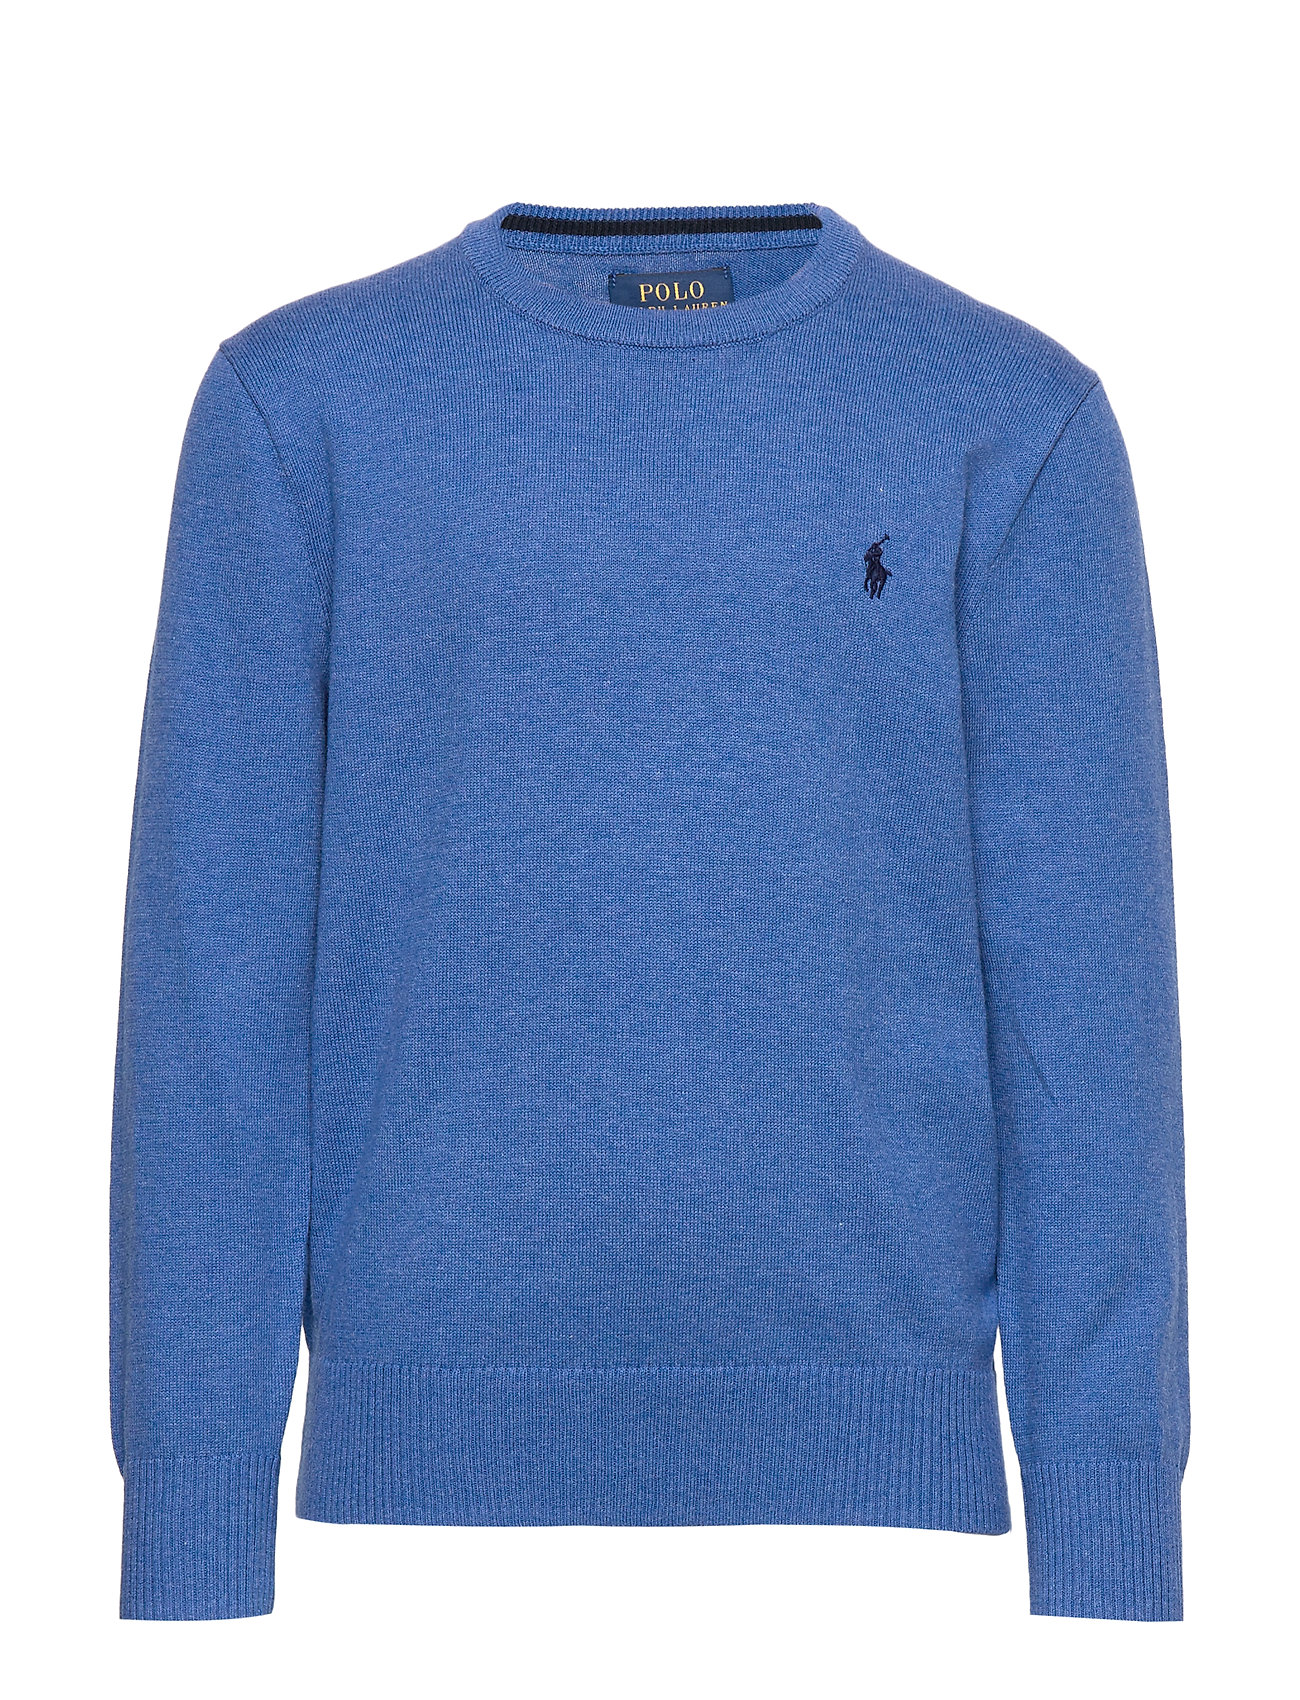 Ralph Lauren Kids Cotton Crewneck Sweater - DOCKSIDE BLUE HEA